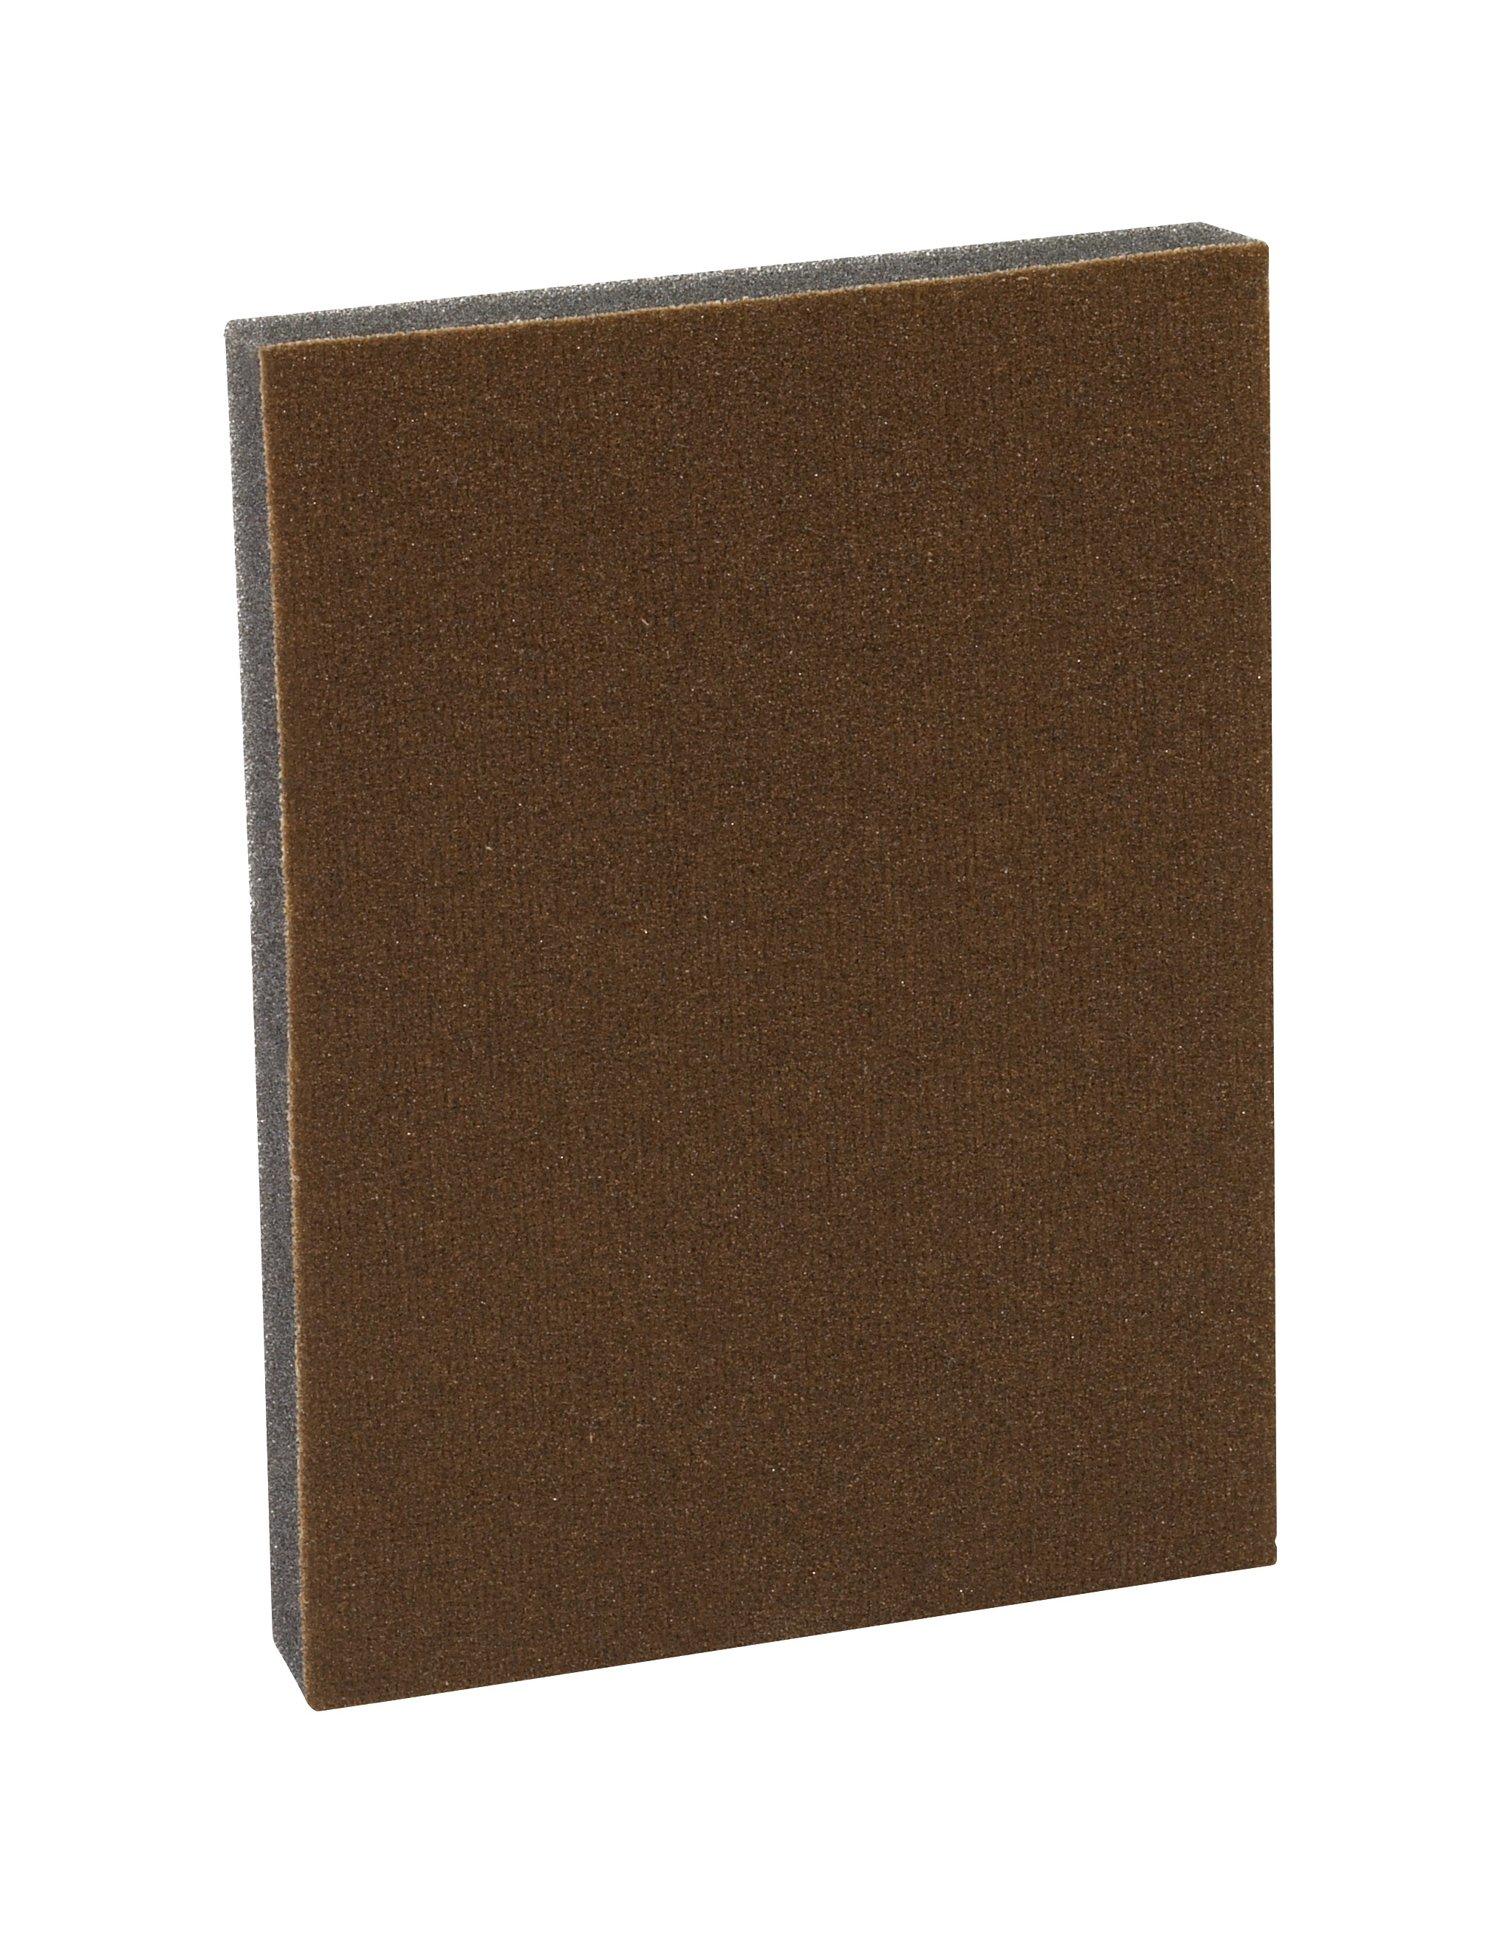 3M Pro-Pad PRPD-150 Sanding Sponge, 2.88 in by 4 in by .5 in, 54-Pack by 3M